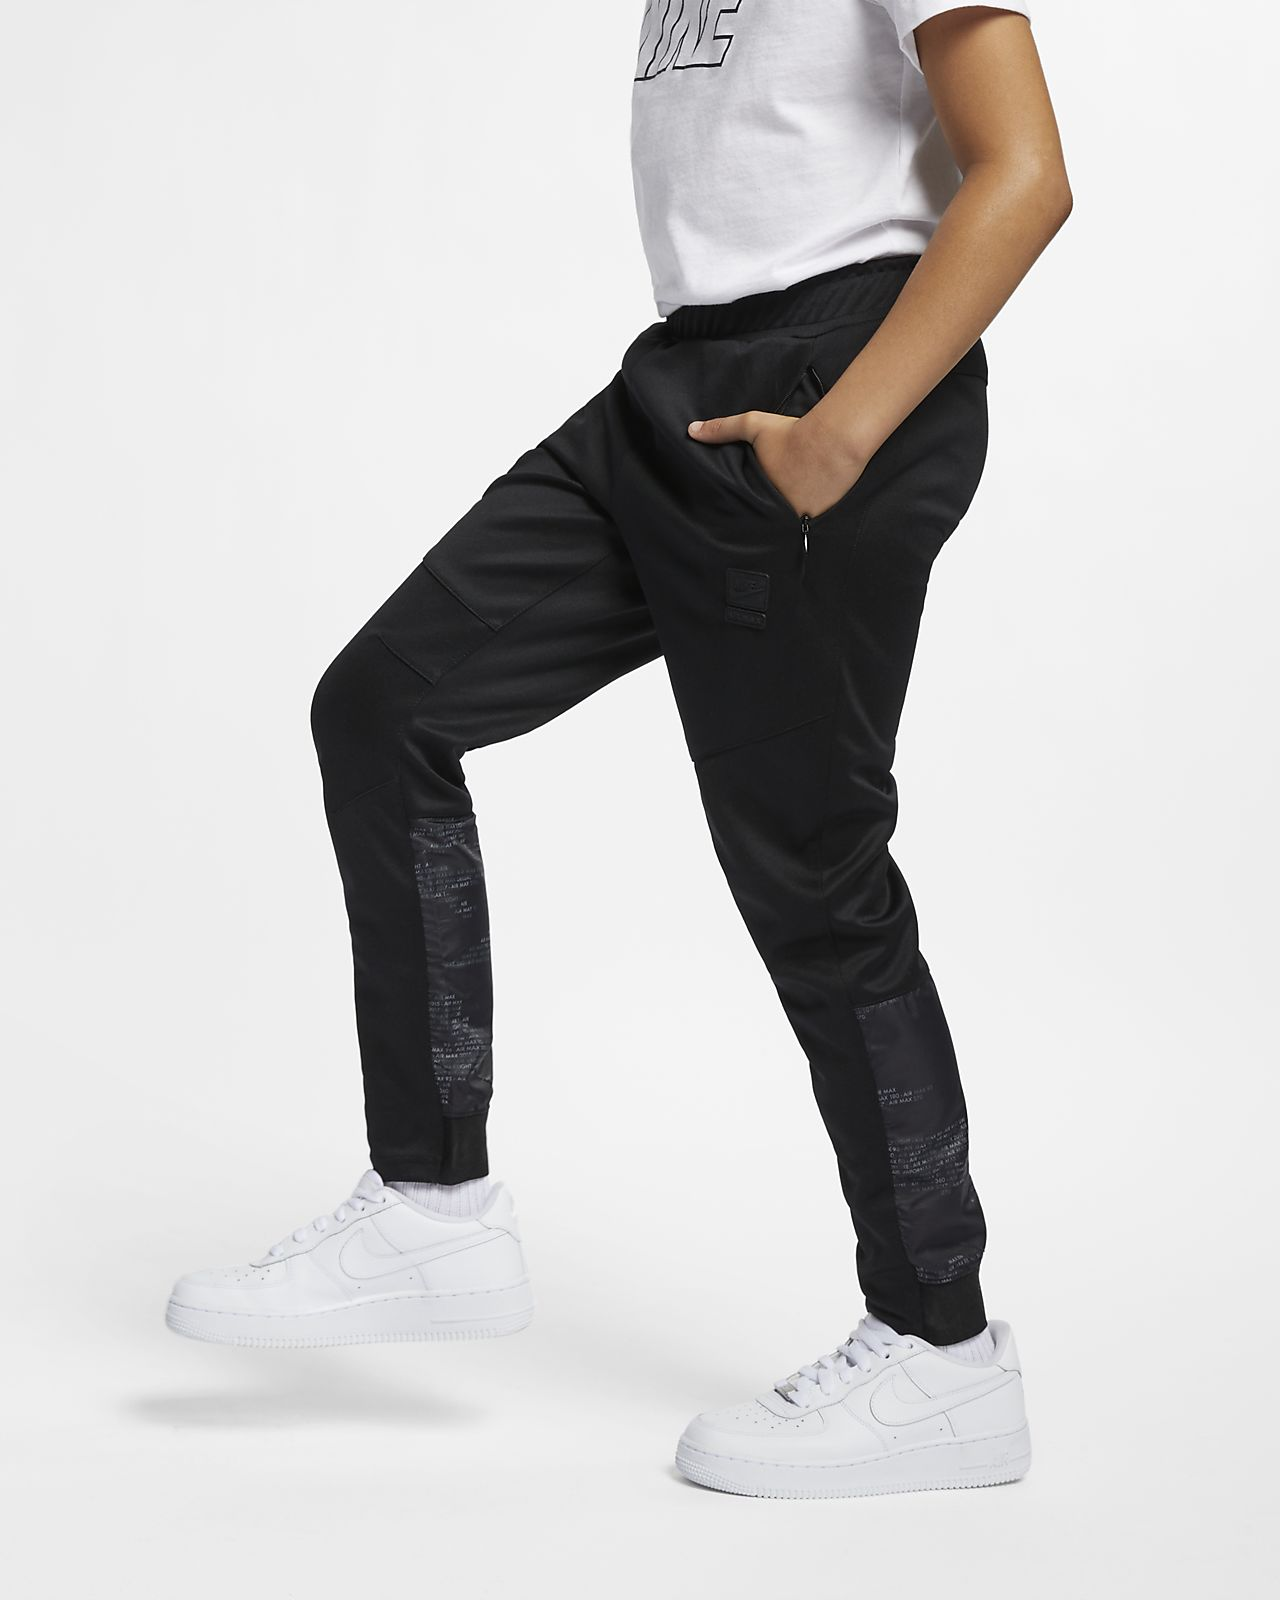 77fd6d9e0e650 Pantalon de jogging Nike Sportswear pour Garçon plus âgé. Nike.com CA